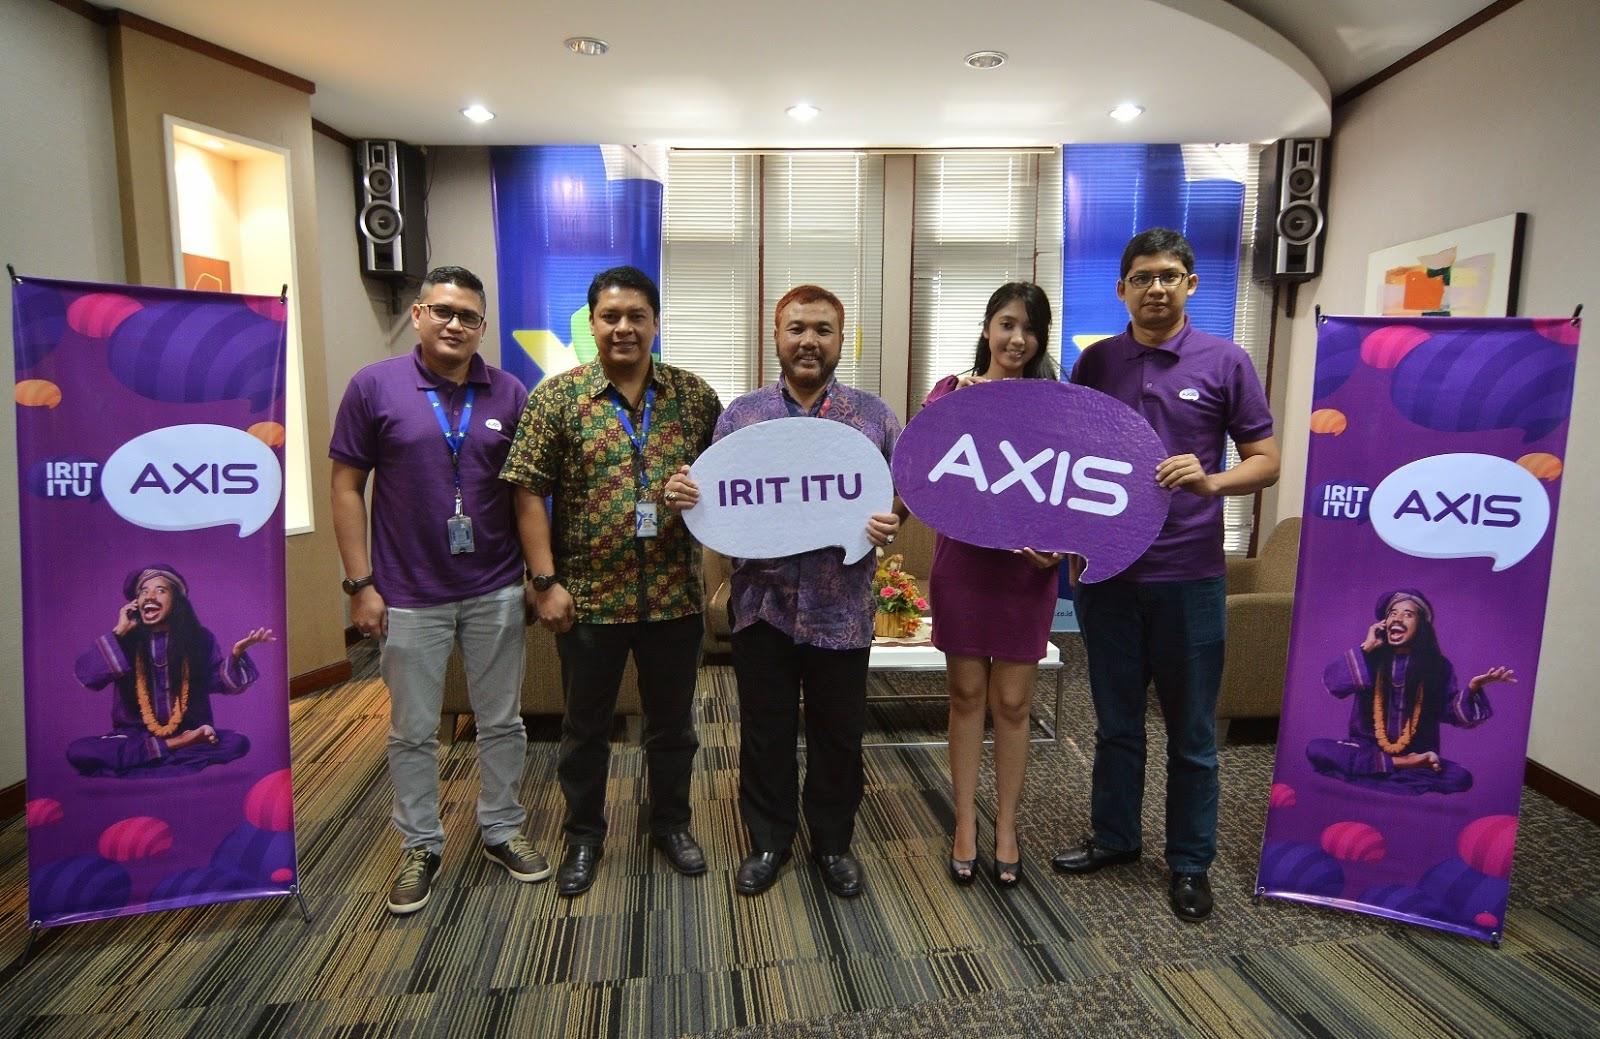 AXIS Hadir Dengan Gaya Hidup Iritology